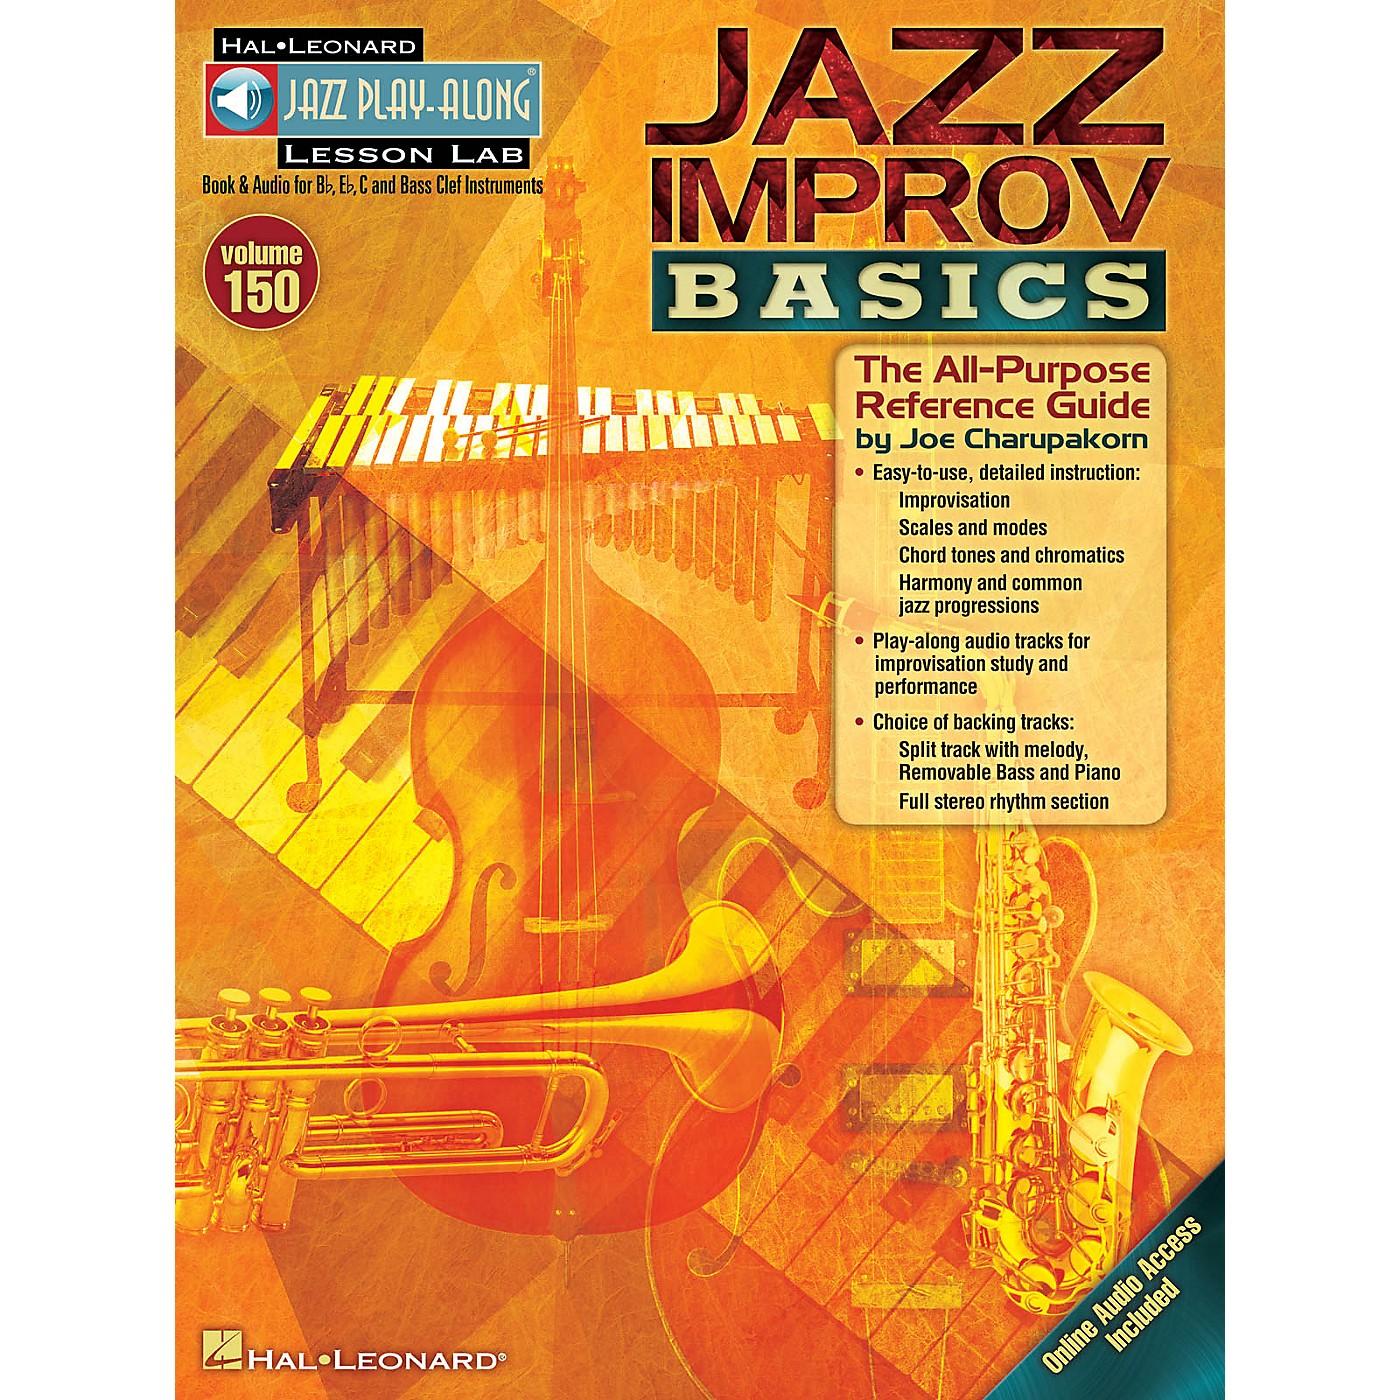 Hal Leonard Jazz Improv Basics Jazz Play Along Series Softcover Audio Online thumbnail